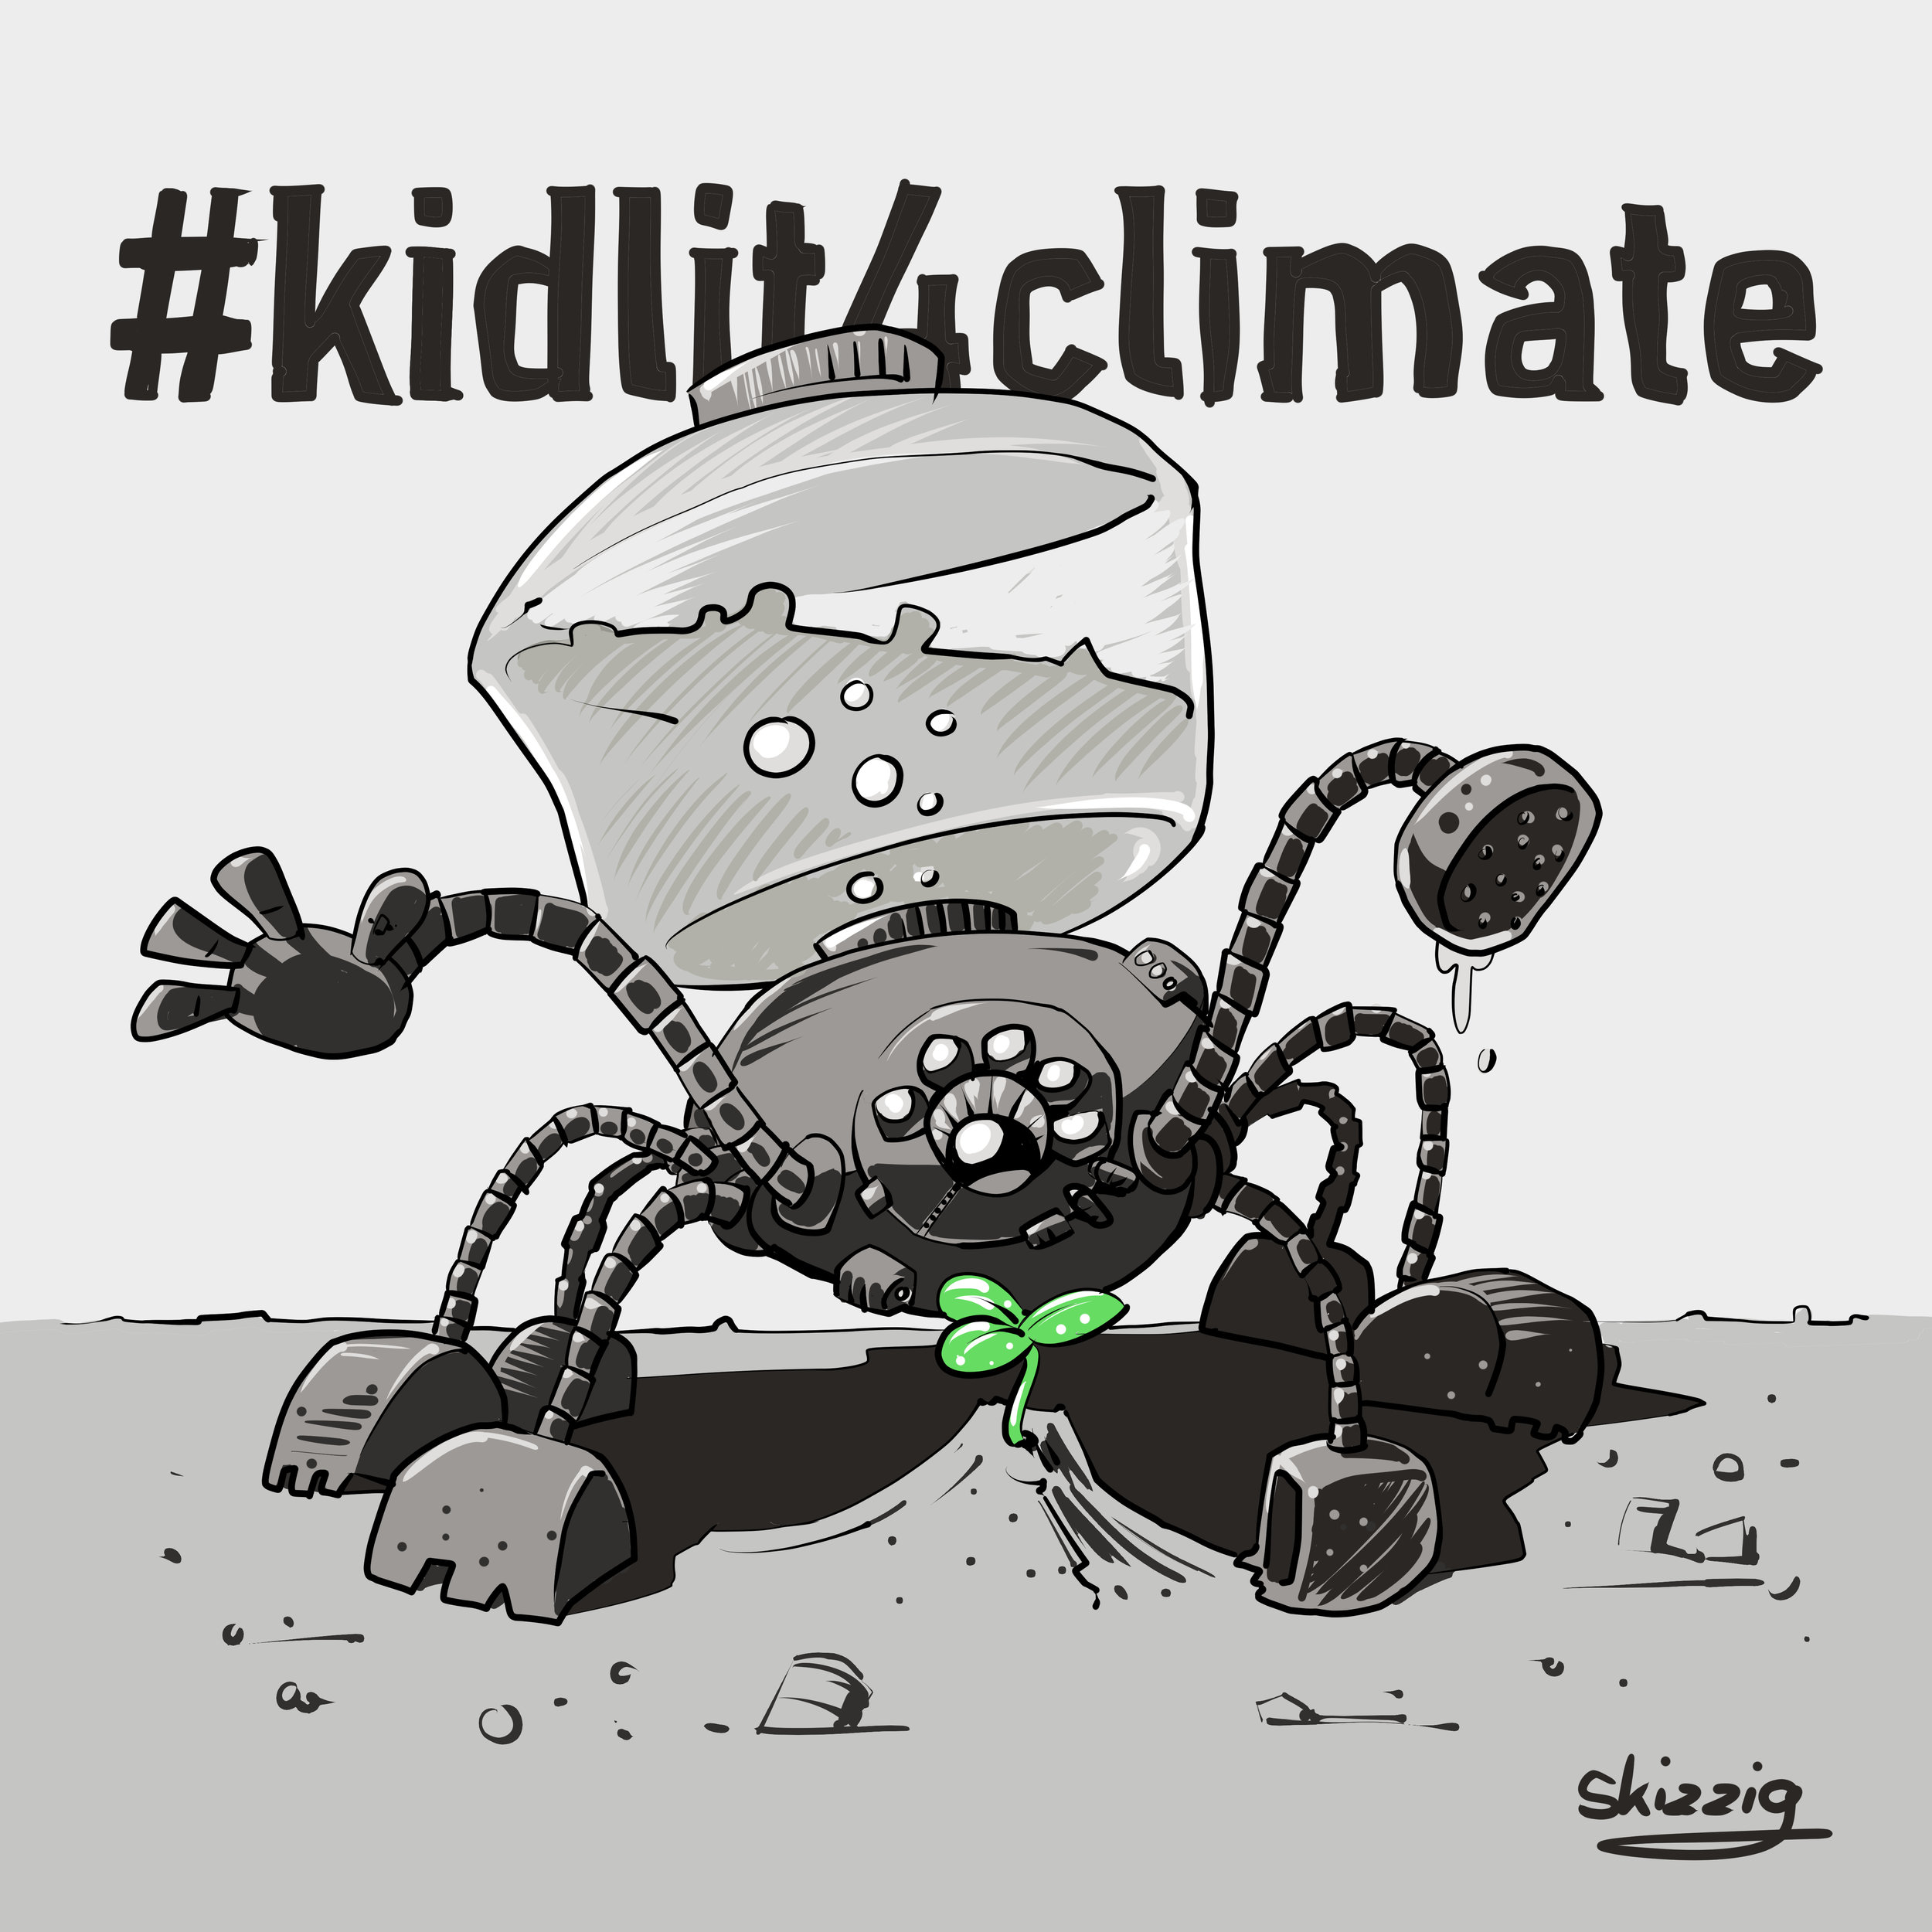 #kitlit4climate.jpg